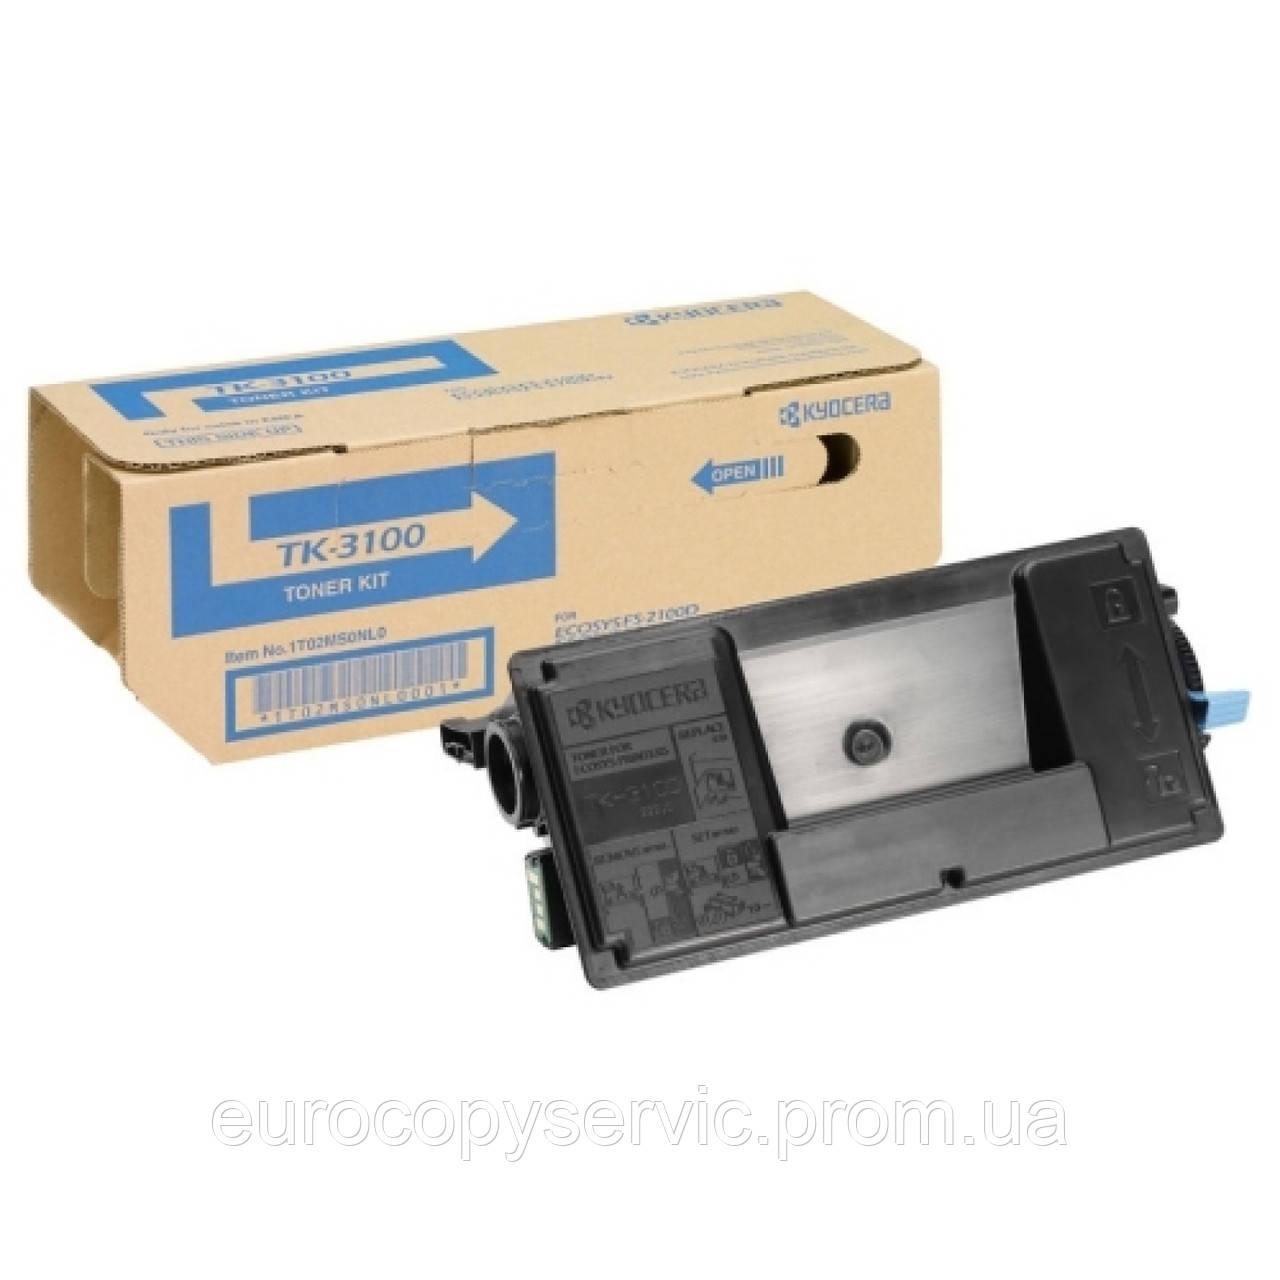 Тонер-картридж Kyocera TK-3100 Black (1T02MS0NL0) Original